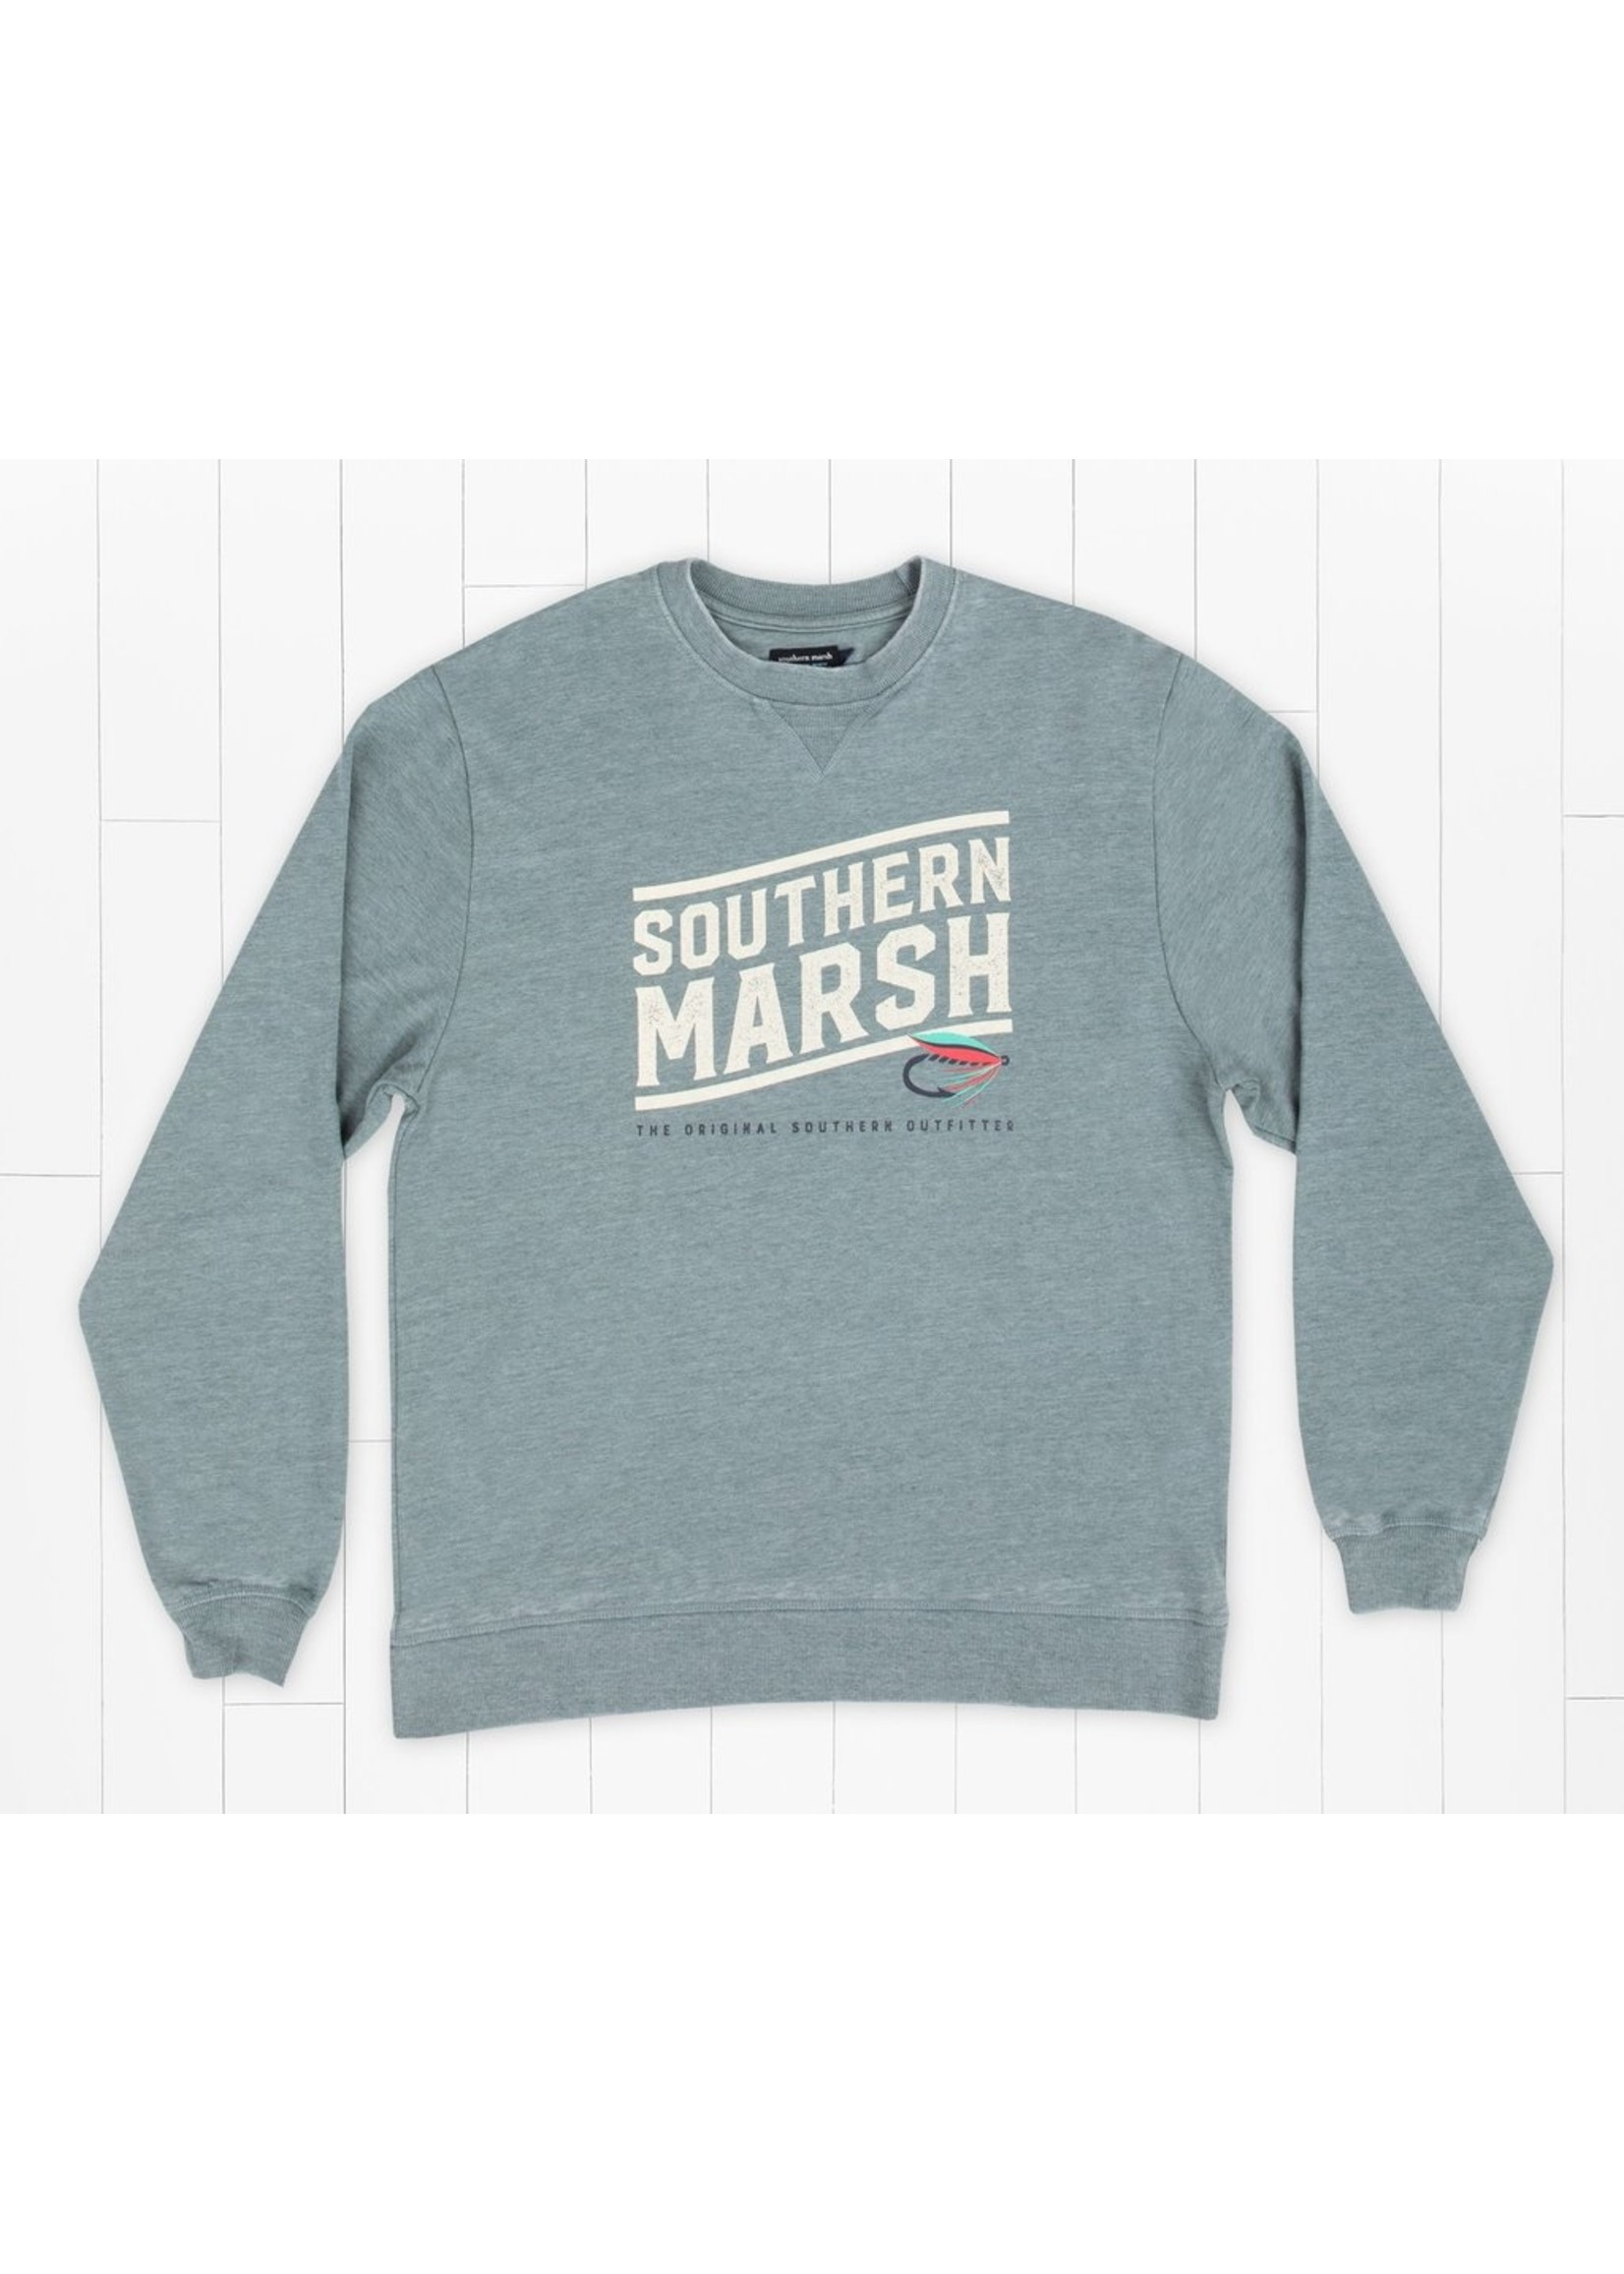 Southern Marsh SEAWASH™ Fly Line Sweatshirt